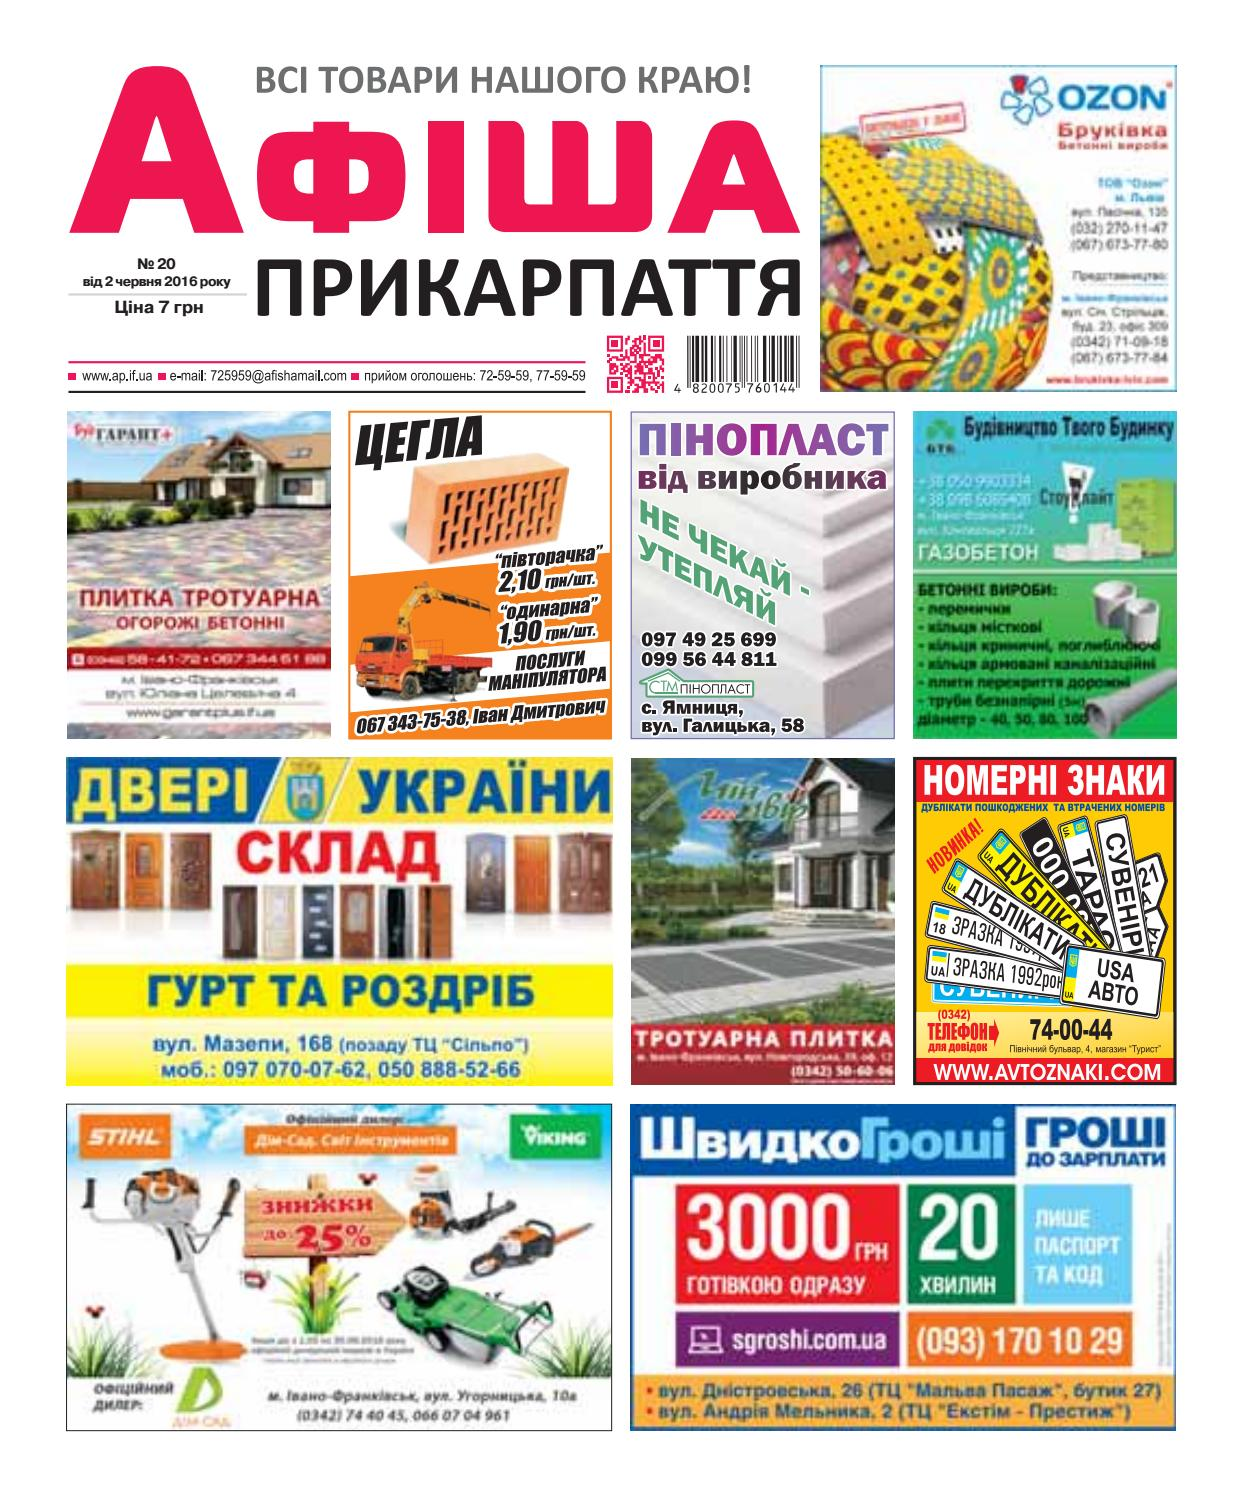 Афіша ПРИКАРПАТТЯ №20 by Olya Olya - issuu 0de63abdacd09